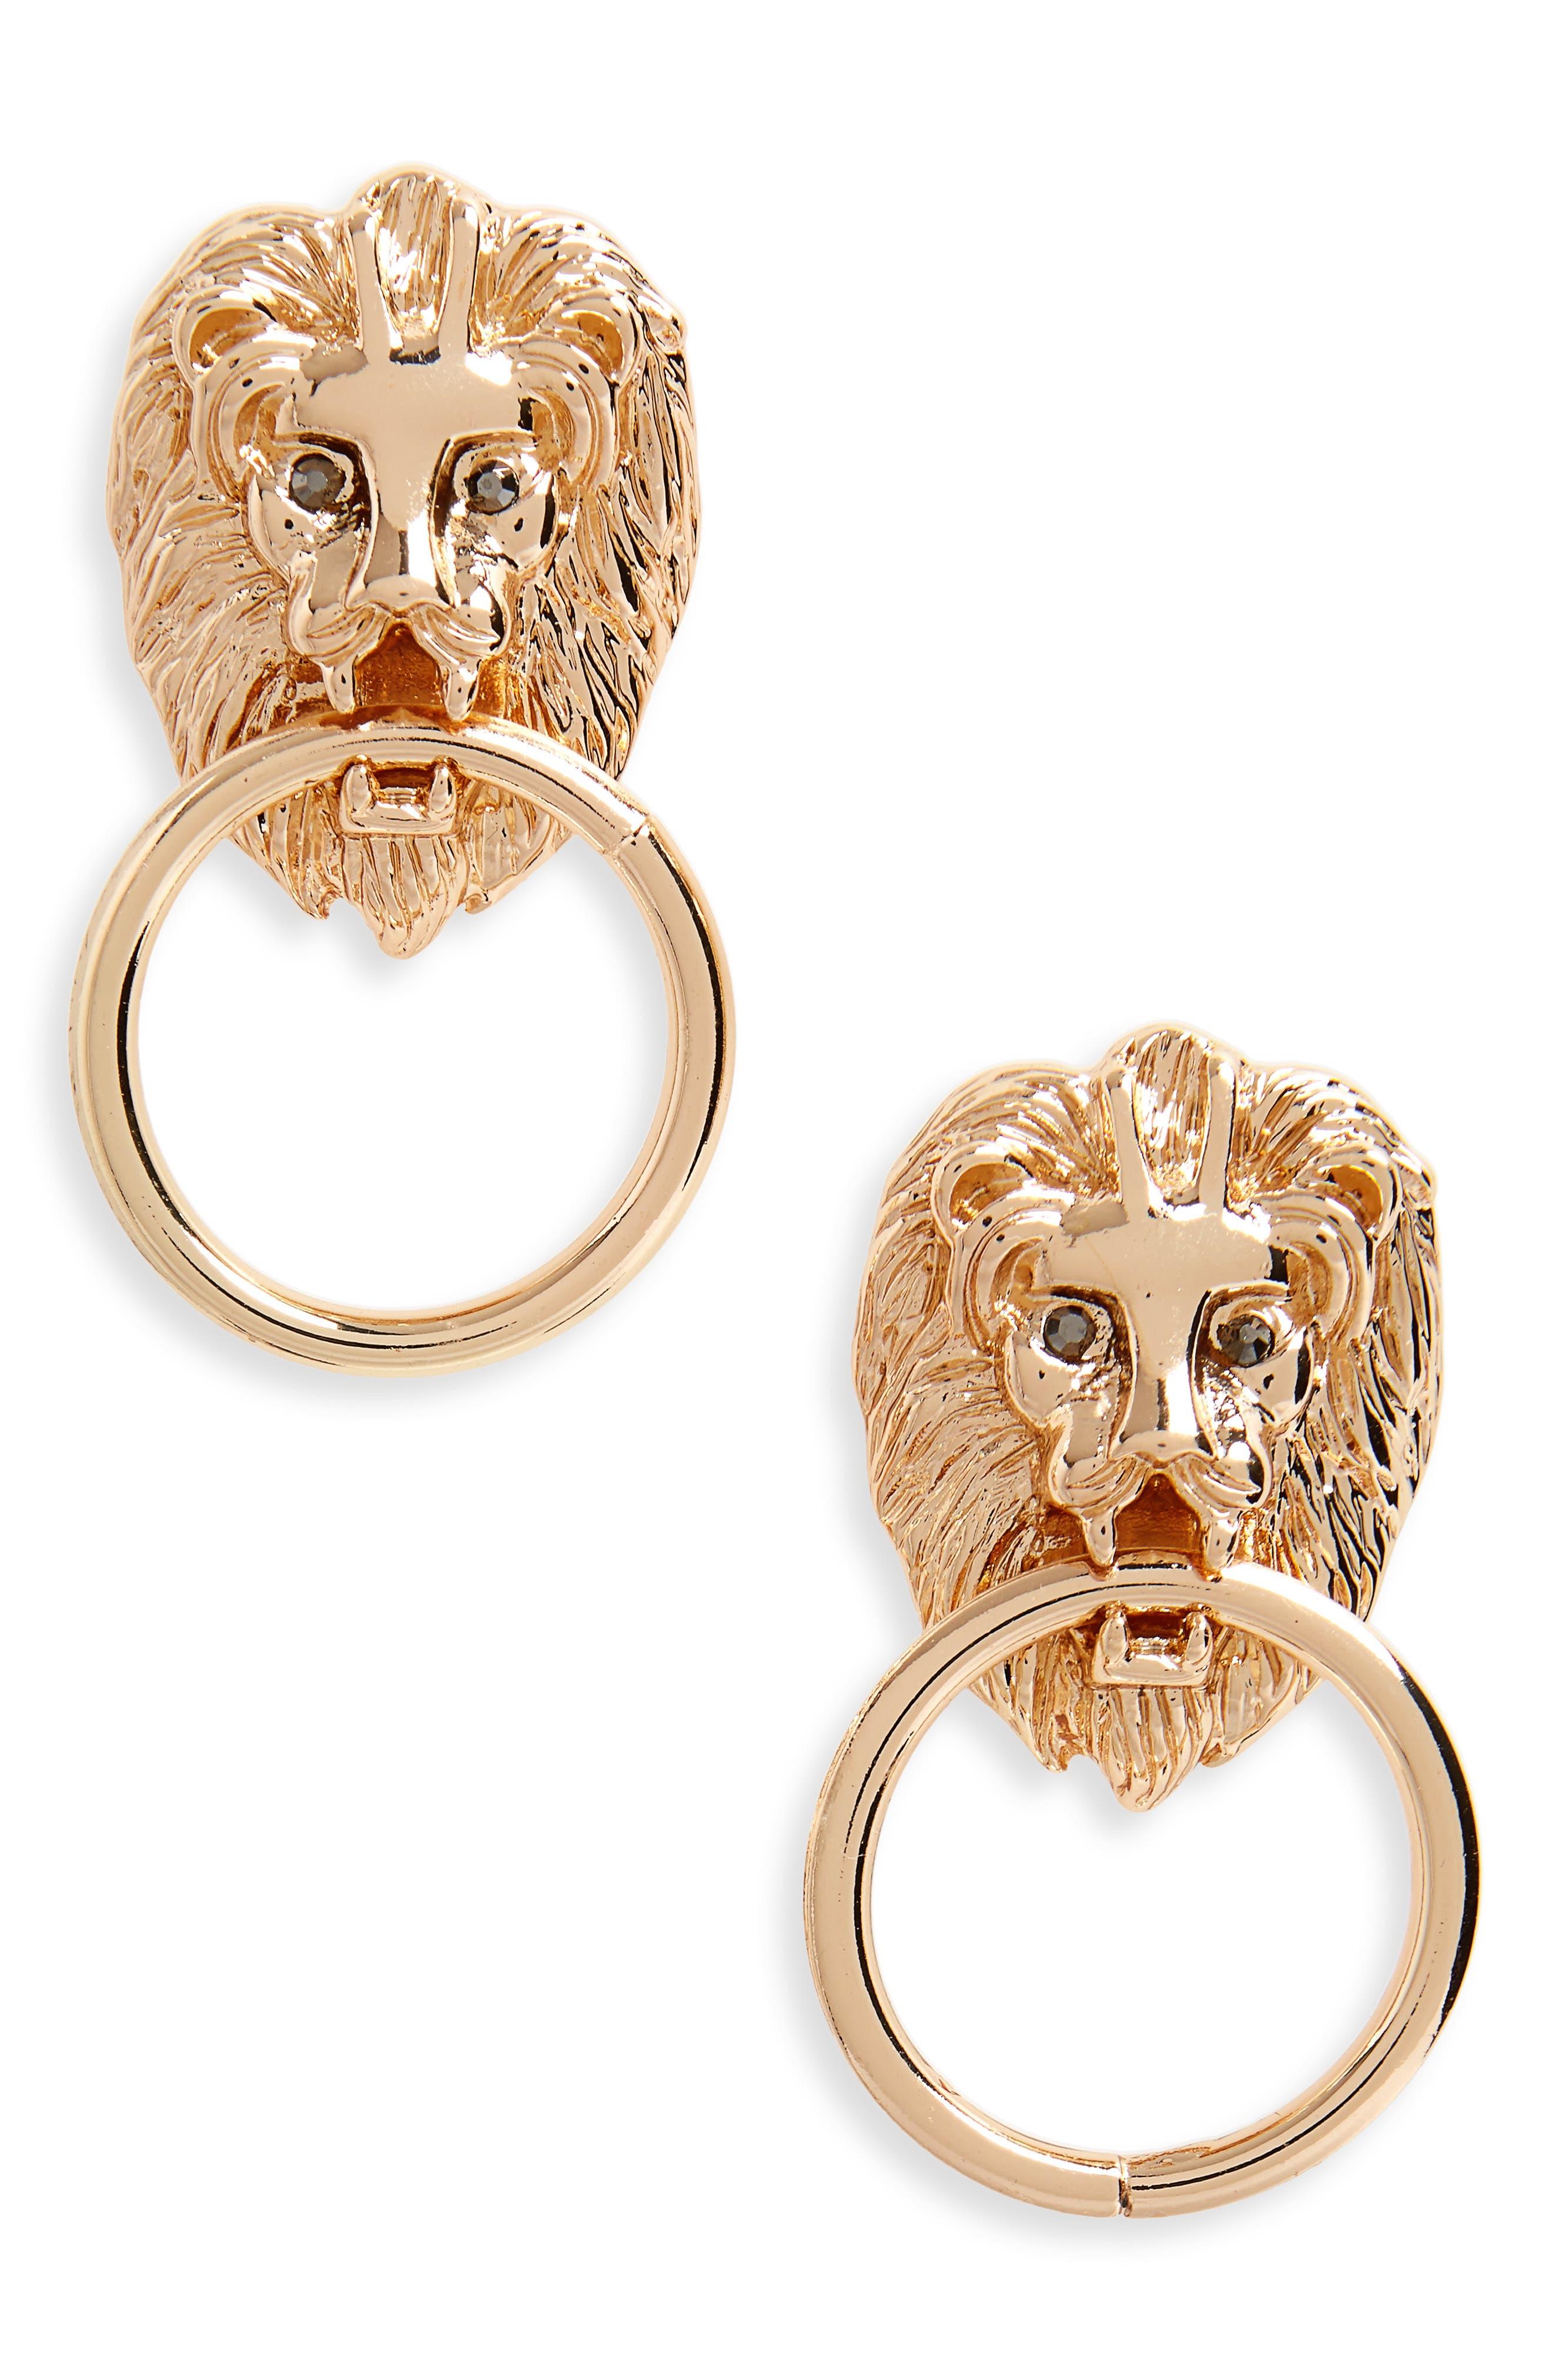 Crystal Lion Doorknocker Earrings,                             Main thumbnail 1, color,                             710